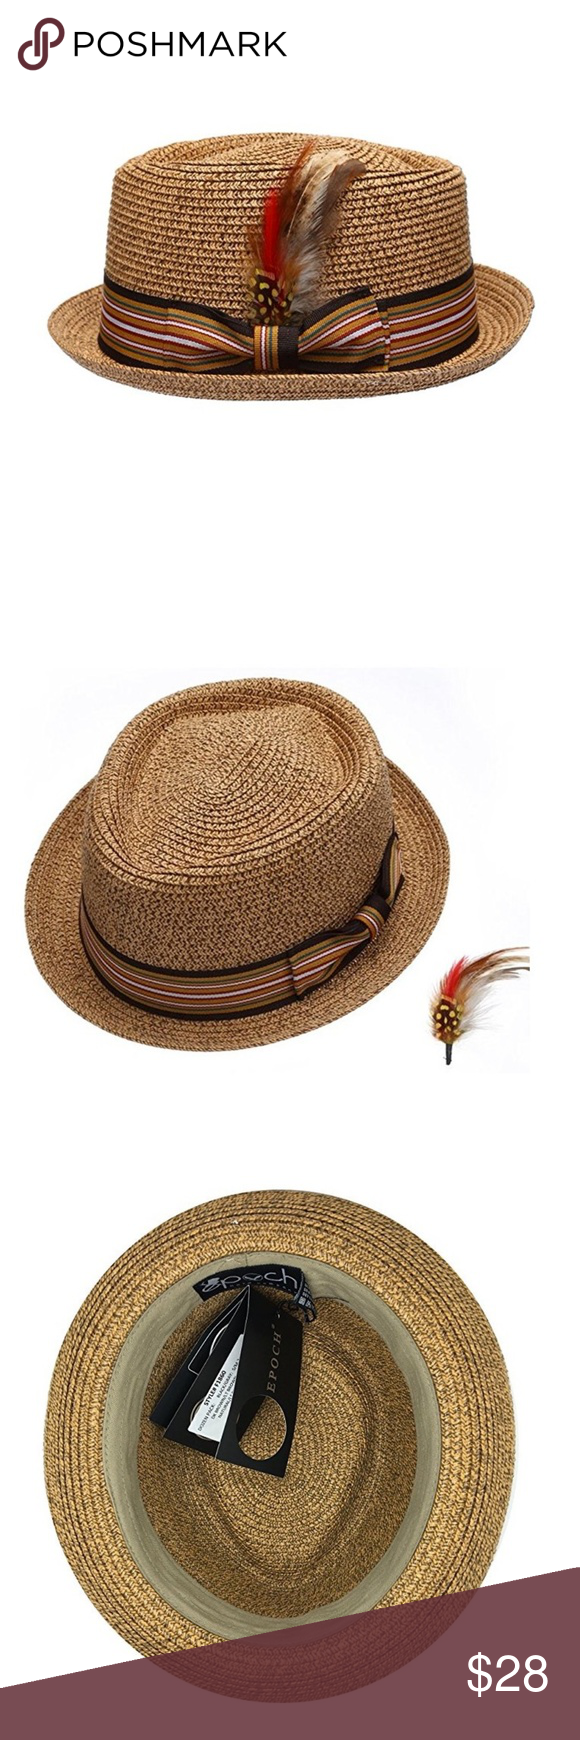 e679a4babf465 Men s Natural Brown Straw Fedora Hat Men s Natural Brown Straw Fedora Hat.  Features- Rounded